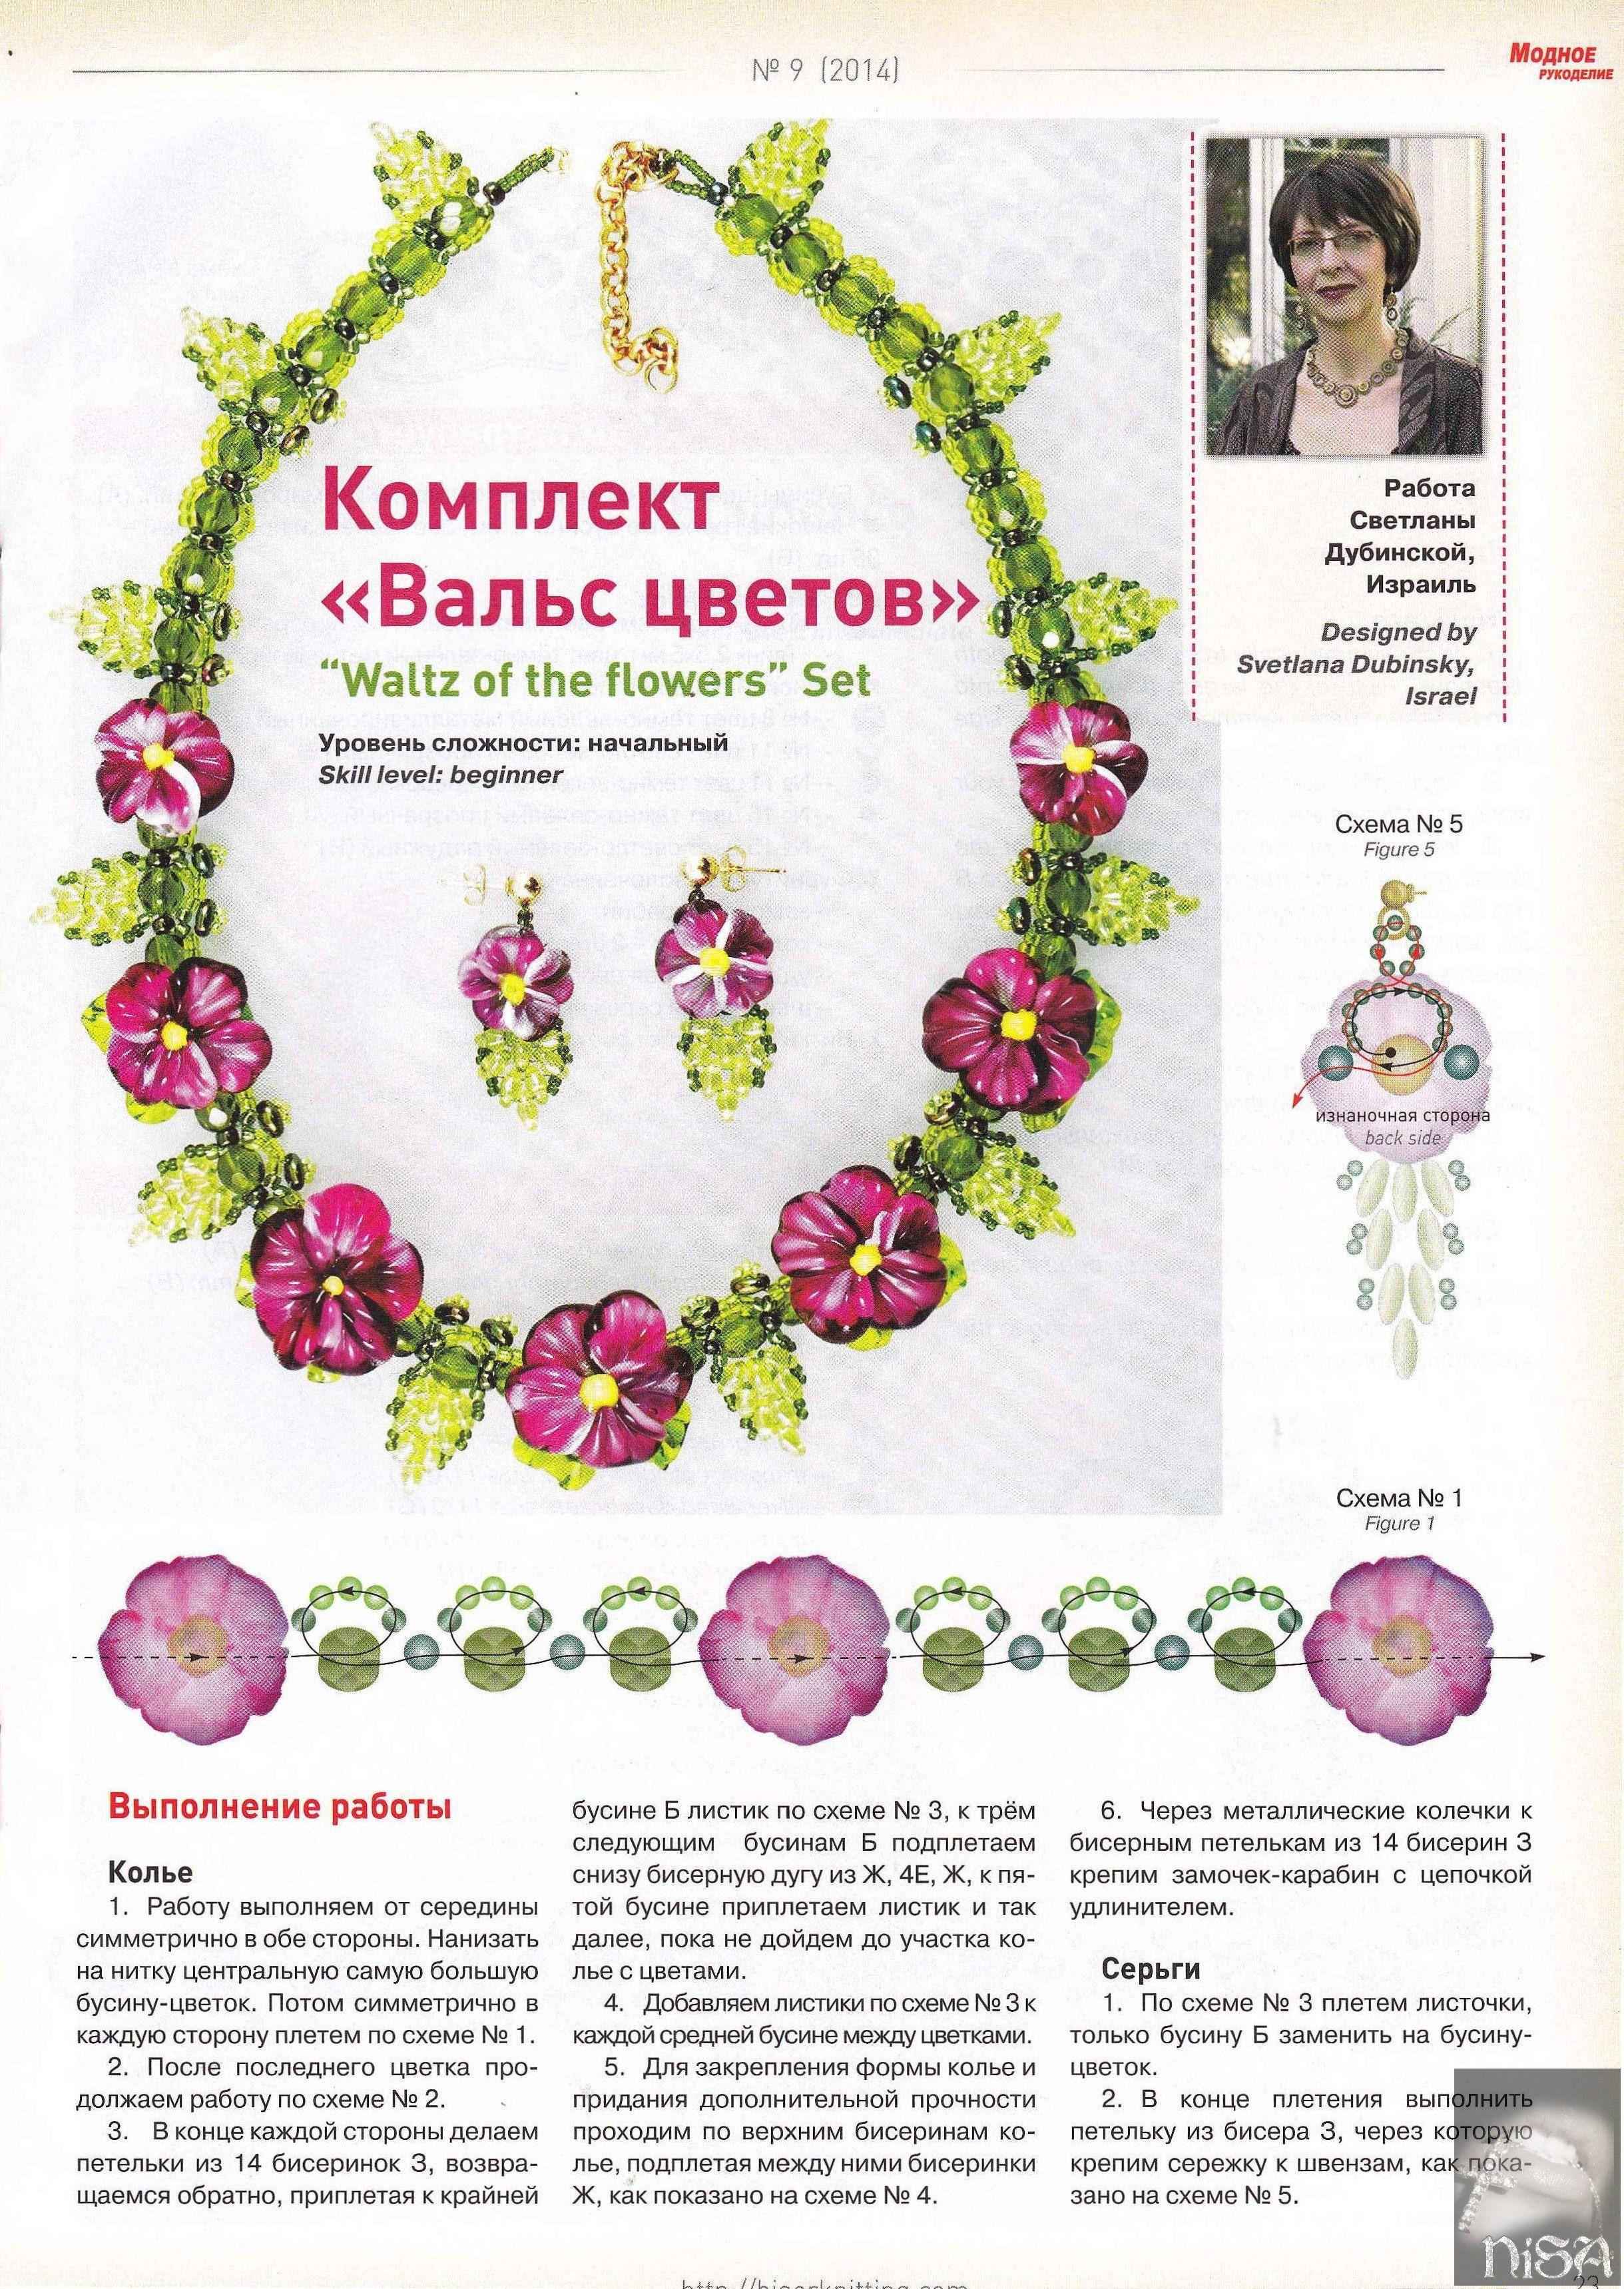 modnuy_9_2014_23.jpg